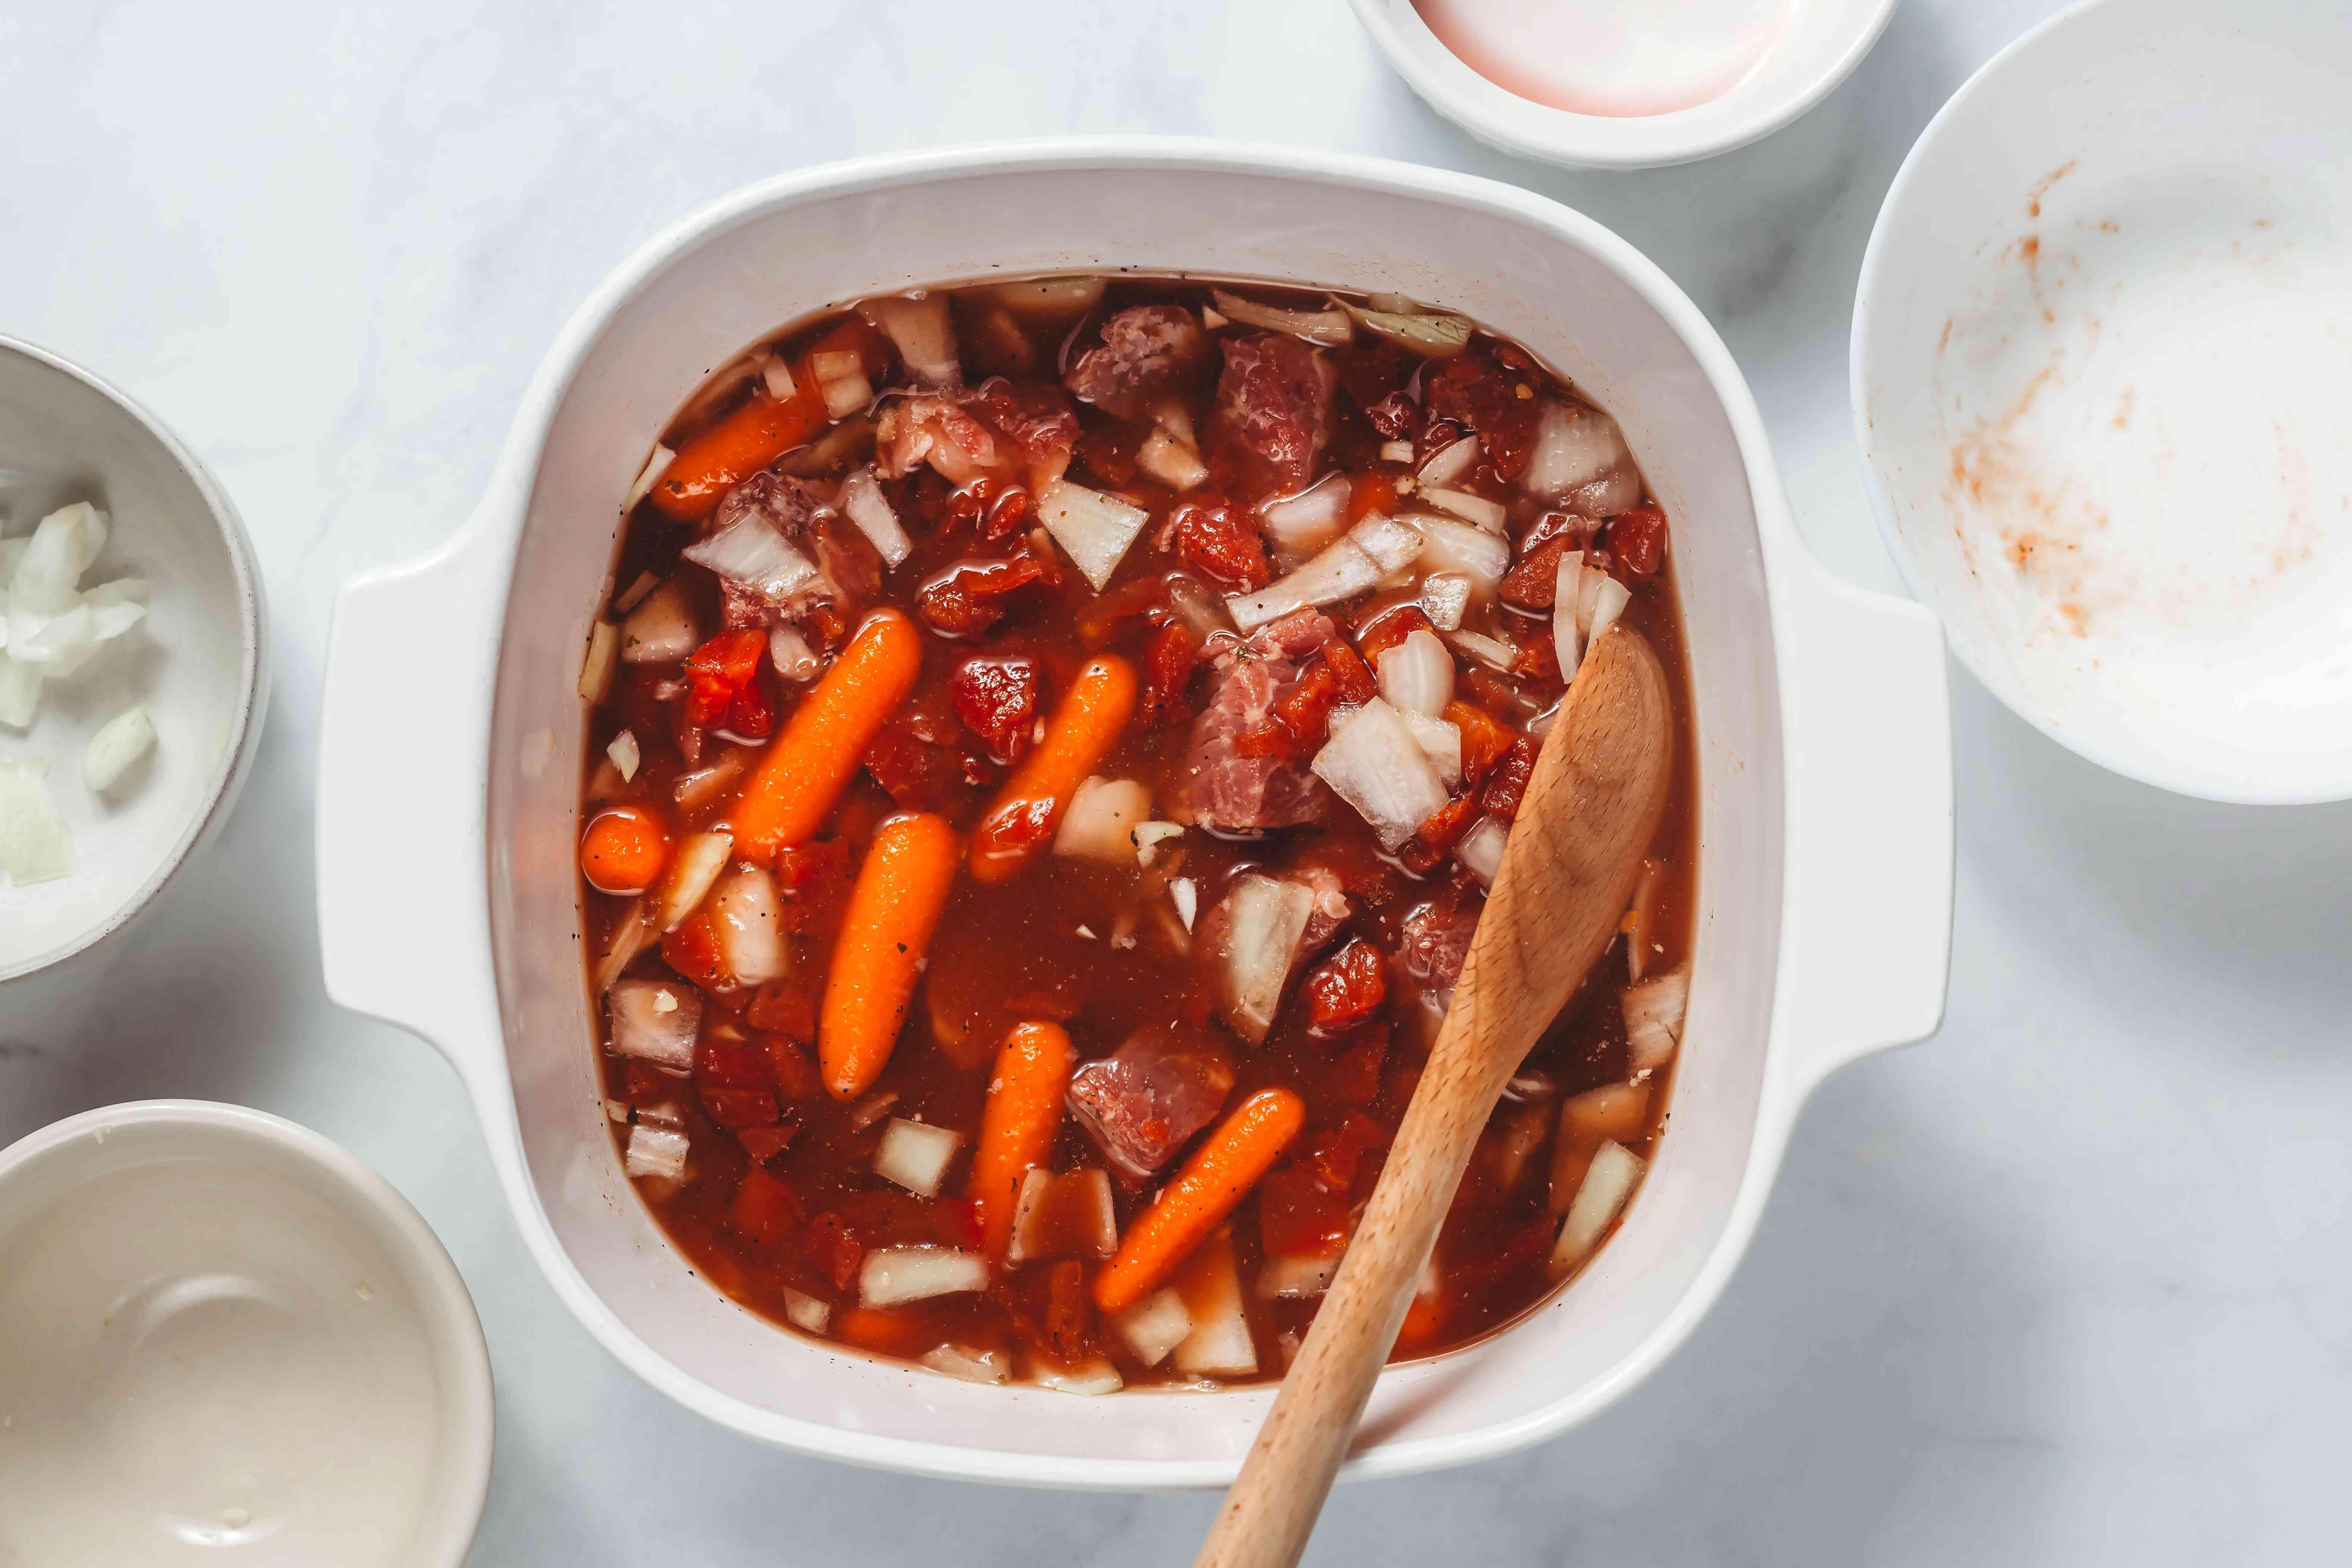 beef stew ingredients in a Crockpot